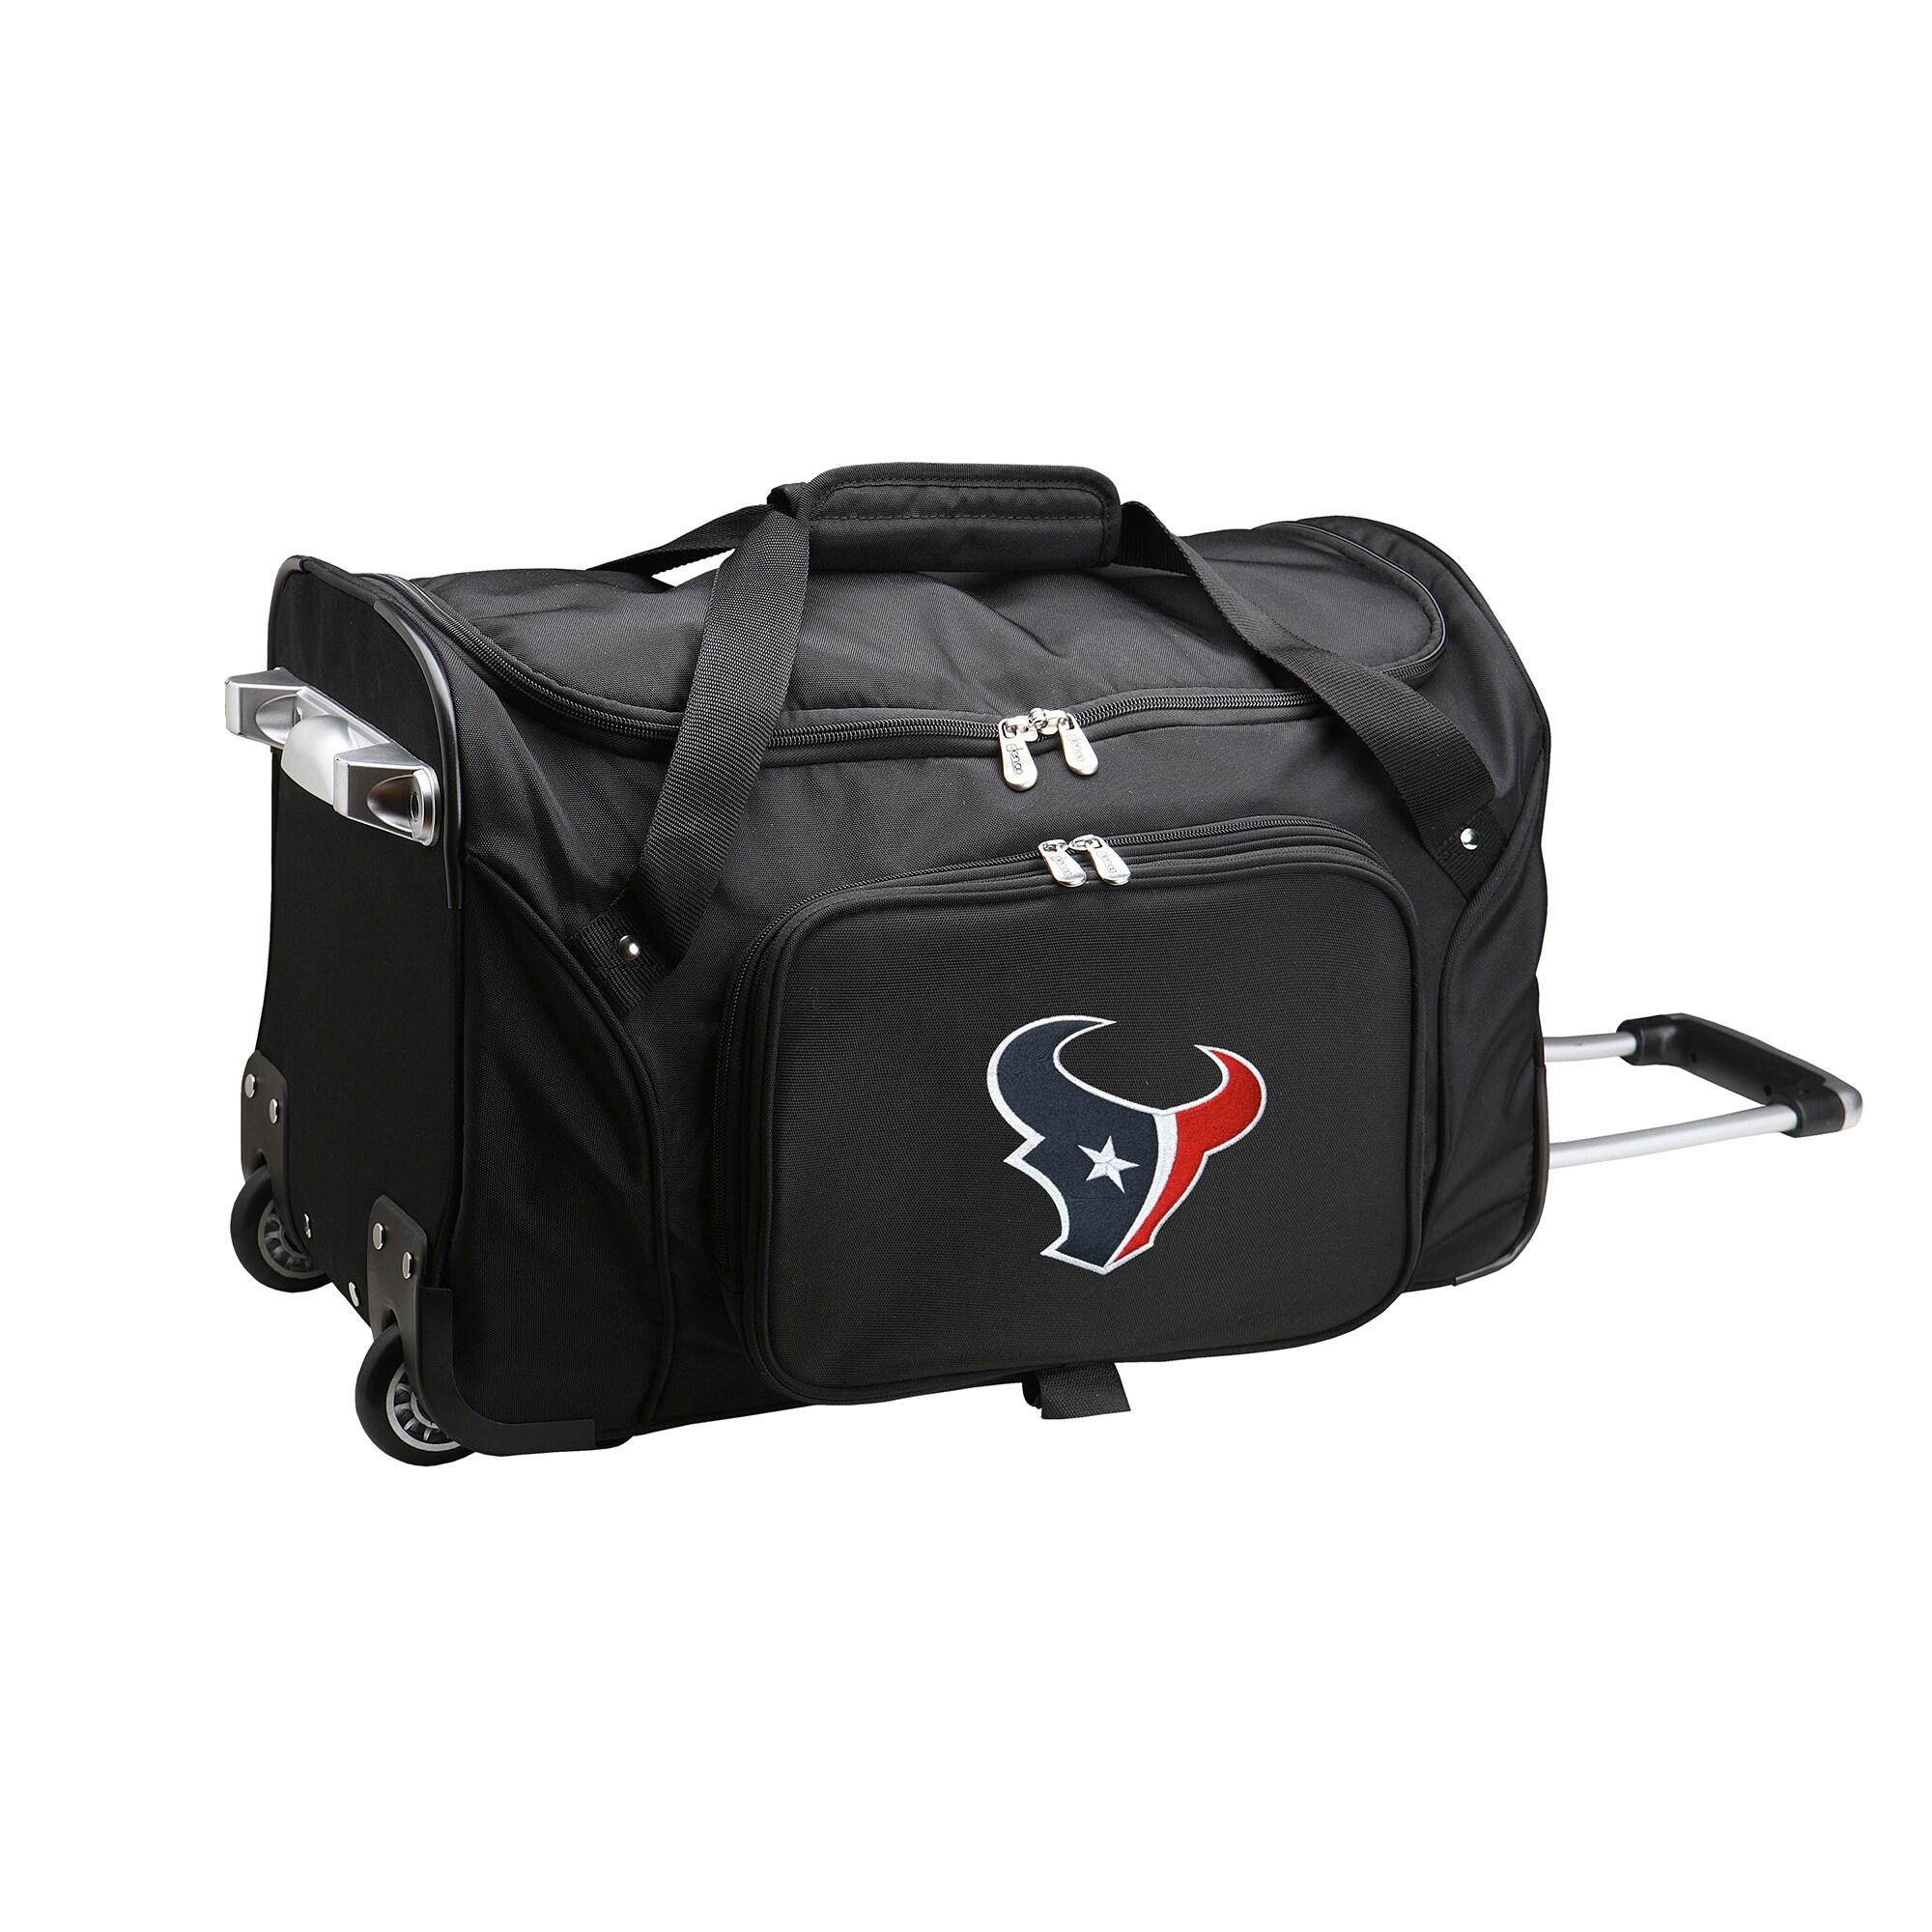 "Houston Texans 22"" 2-Wheeled Duffel Bag - Black"